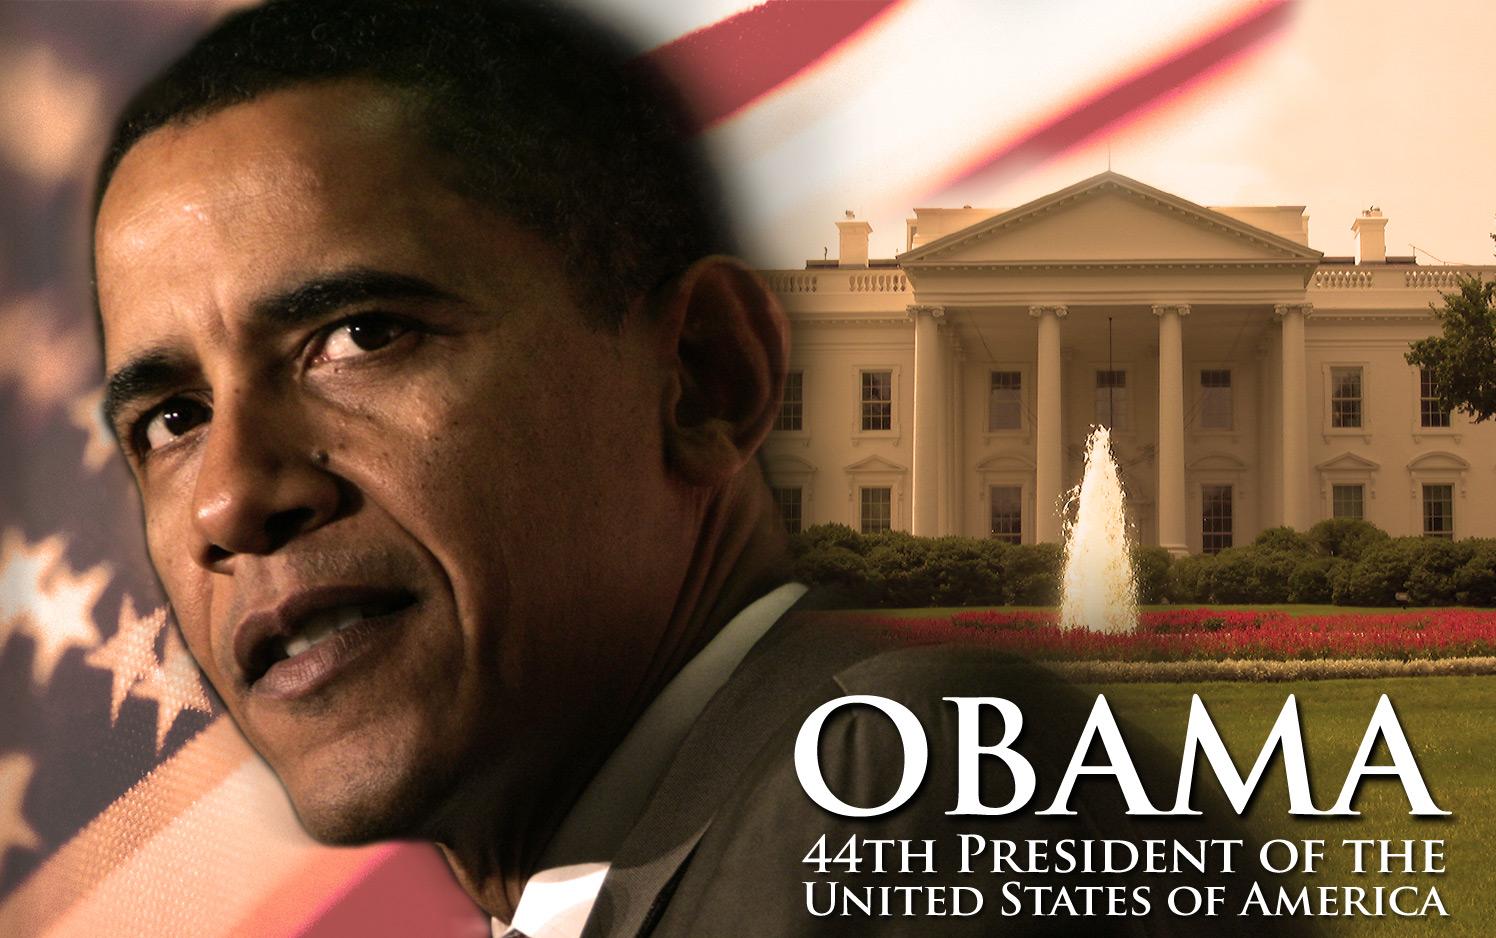 Barack Obama to be America's first black president